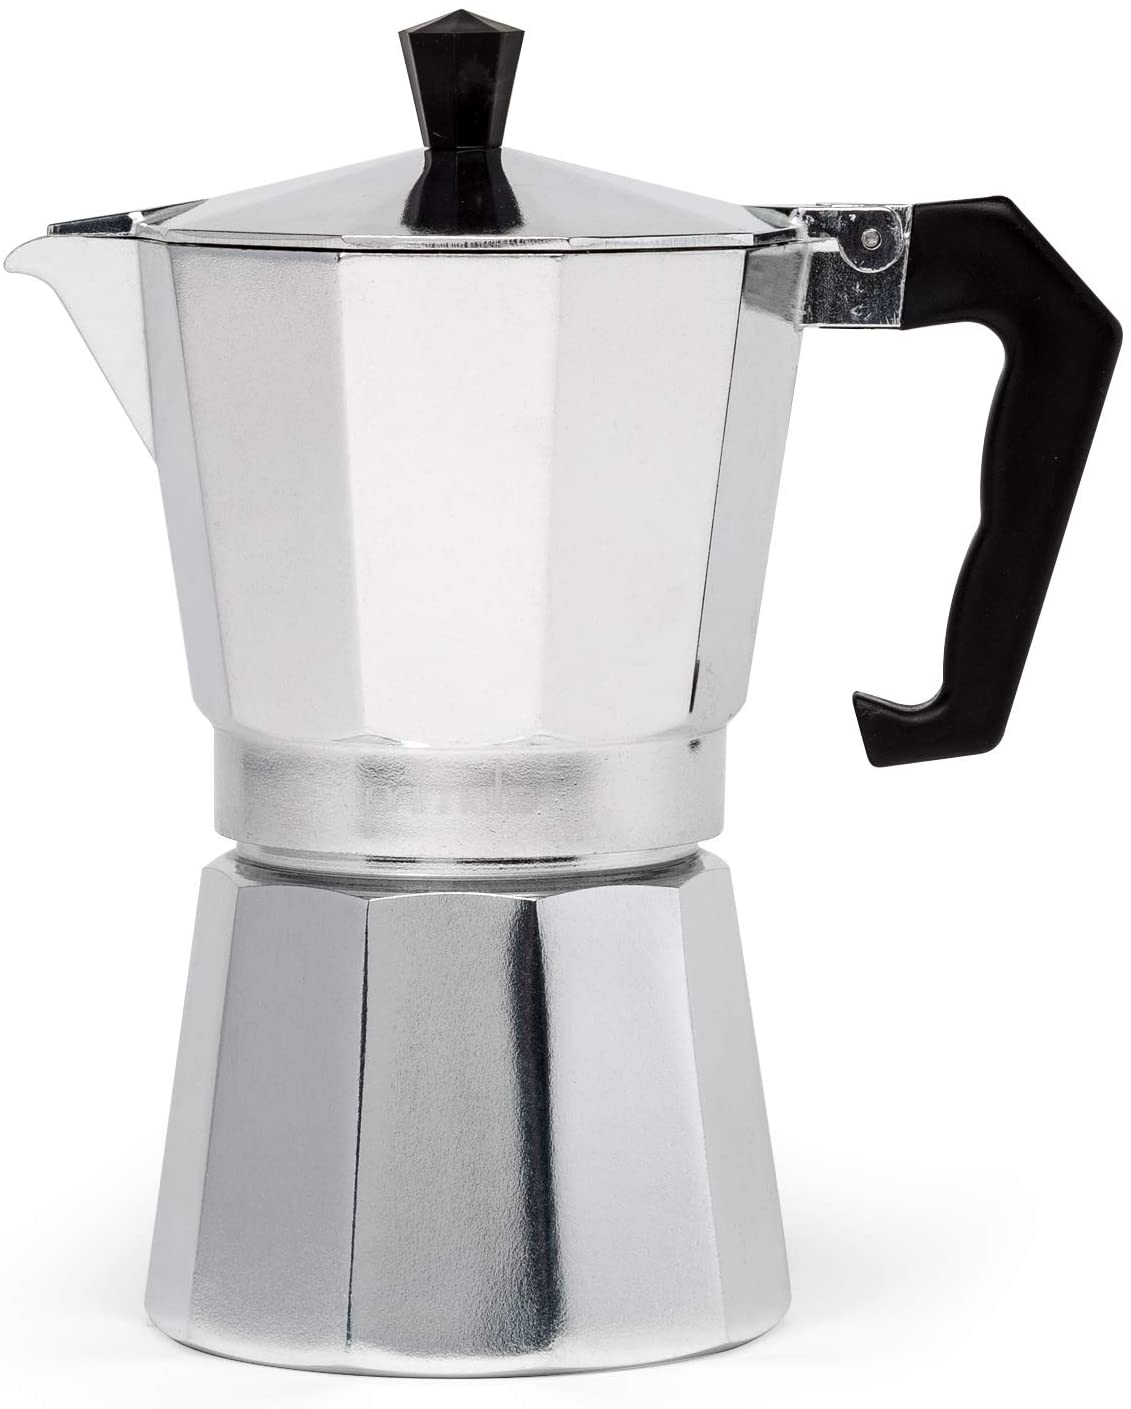 Primula Aluminum Espresso Maker – Aluminum – For Bold, Full Body Espresso – Makes 6 Cups (PES-3306)